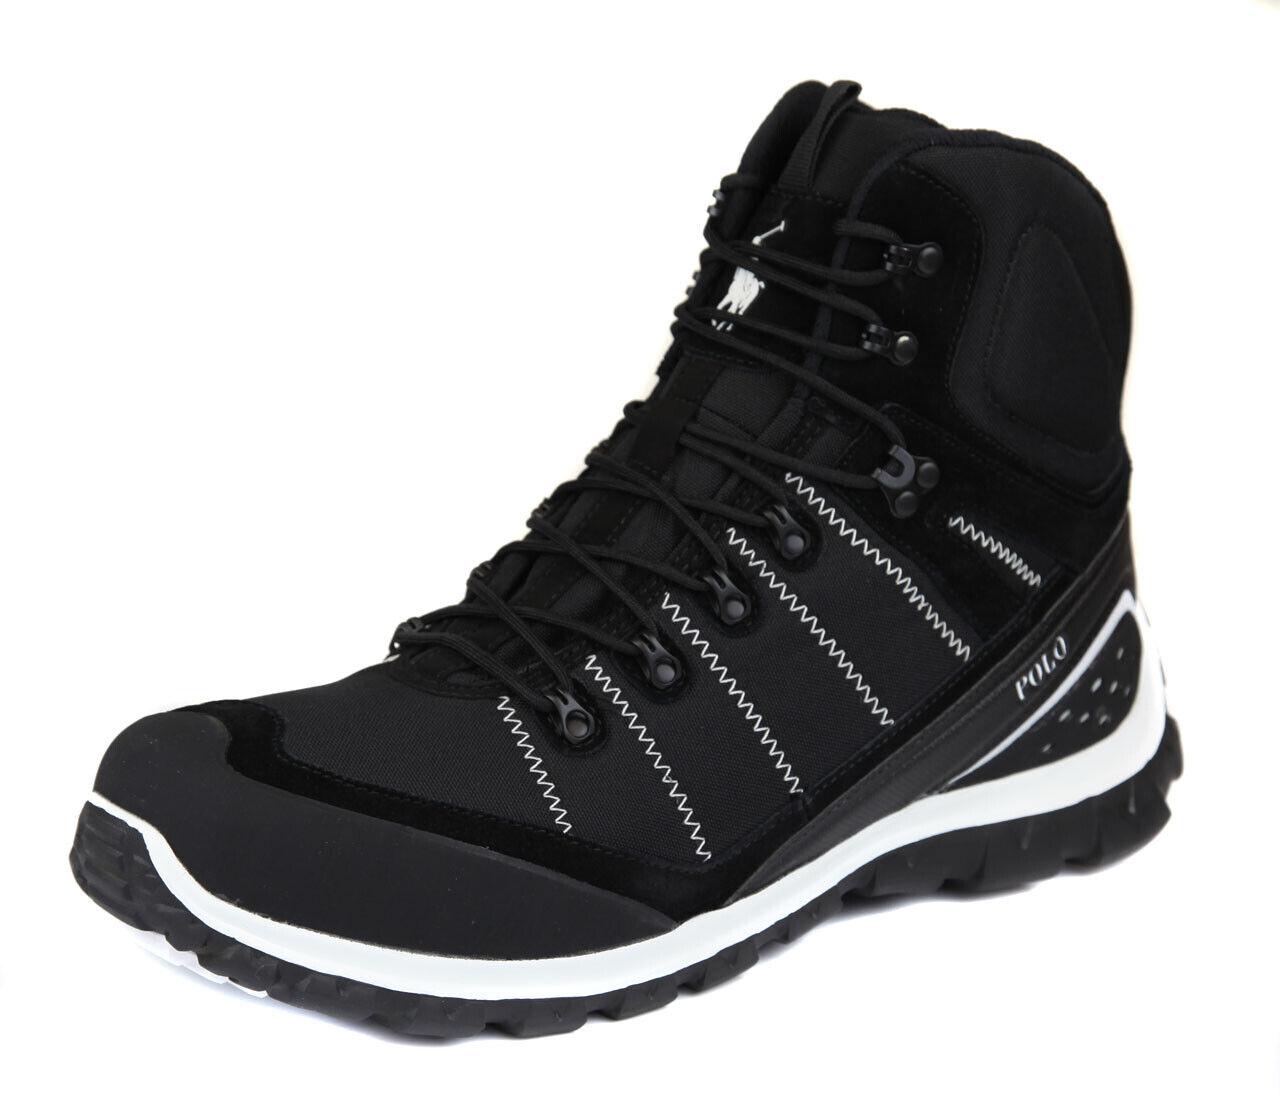 Polo Ralph Lauren Para hombres Negro blancoo S Con Cordones Zapatos Bota Ret  Nuevo